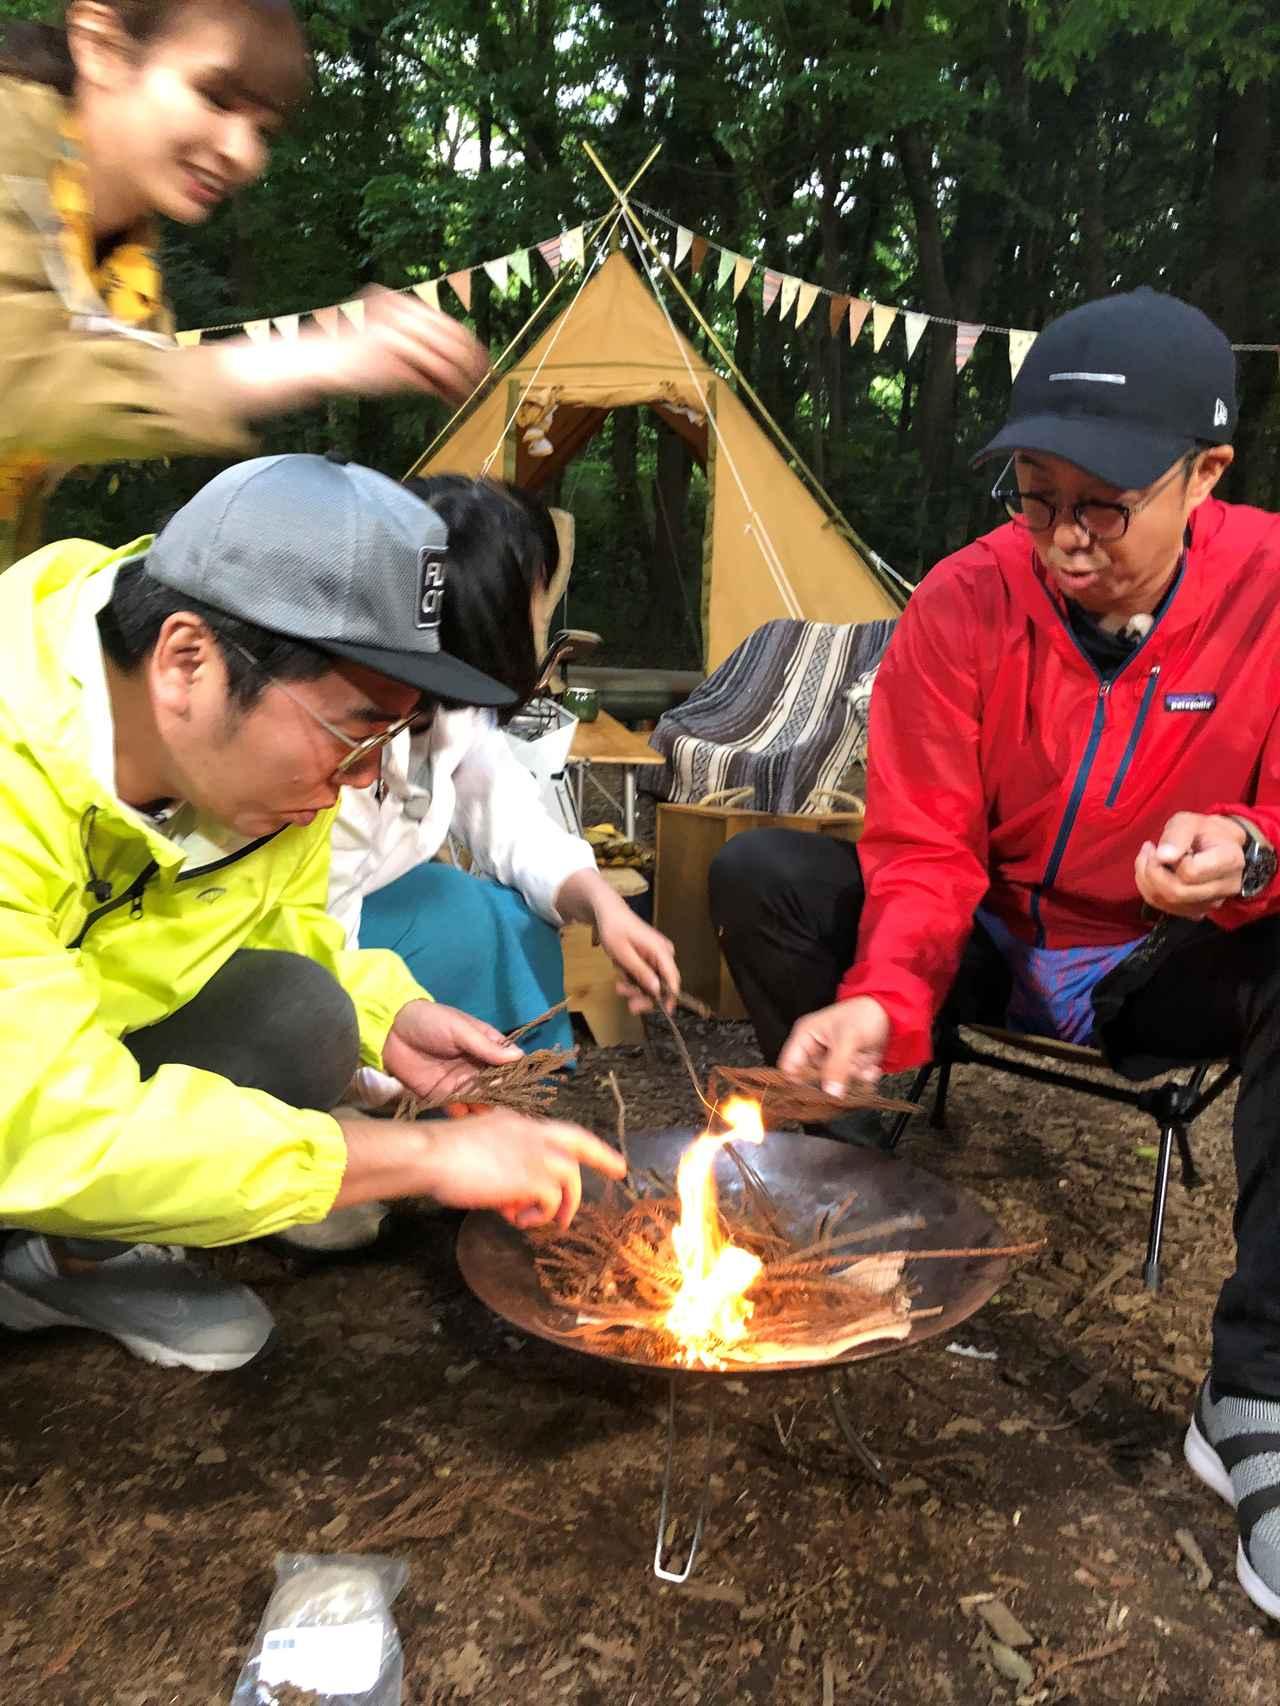 Images : 16番目の画像 - おぎやはぎのハピキャン「映えキャンプ」写真集 - ハピキャン|キャンプ・アウトドア情報メディア